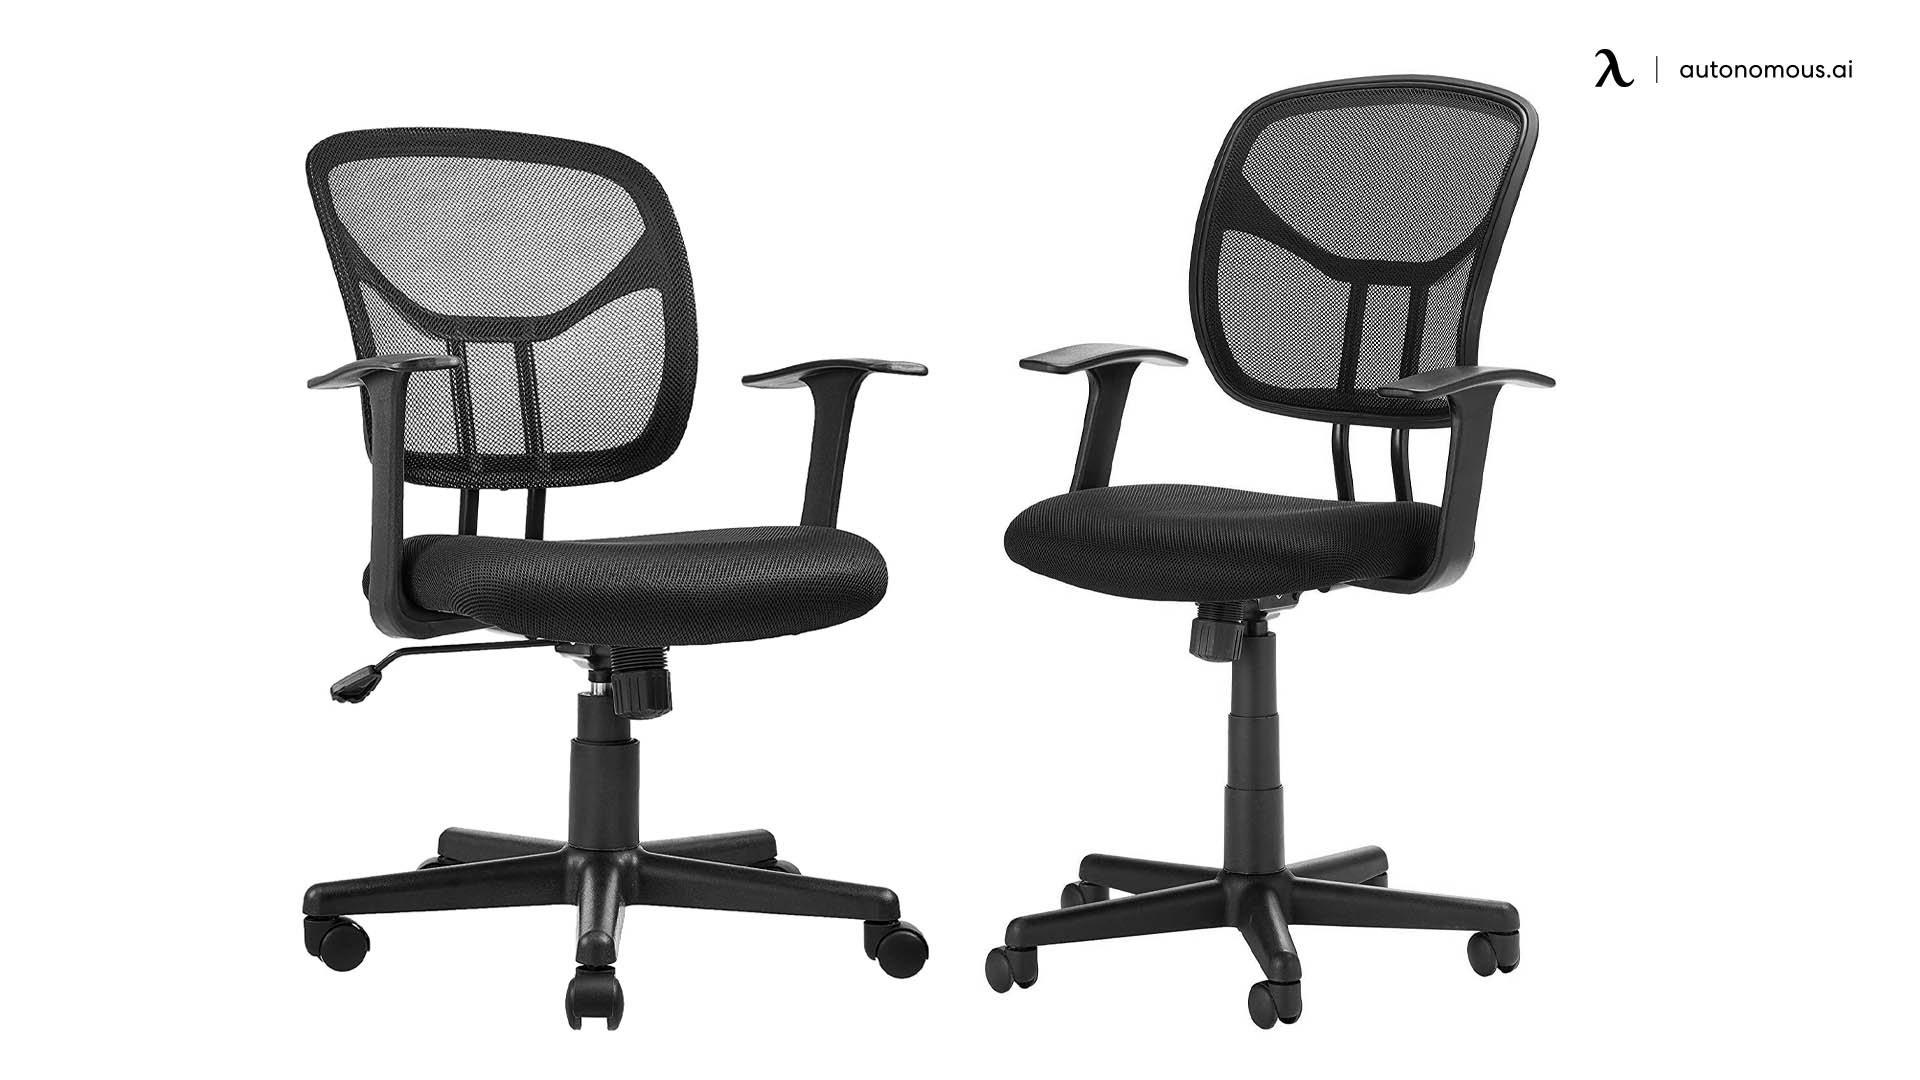 AmazonBasics Mesh office chair